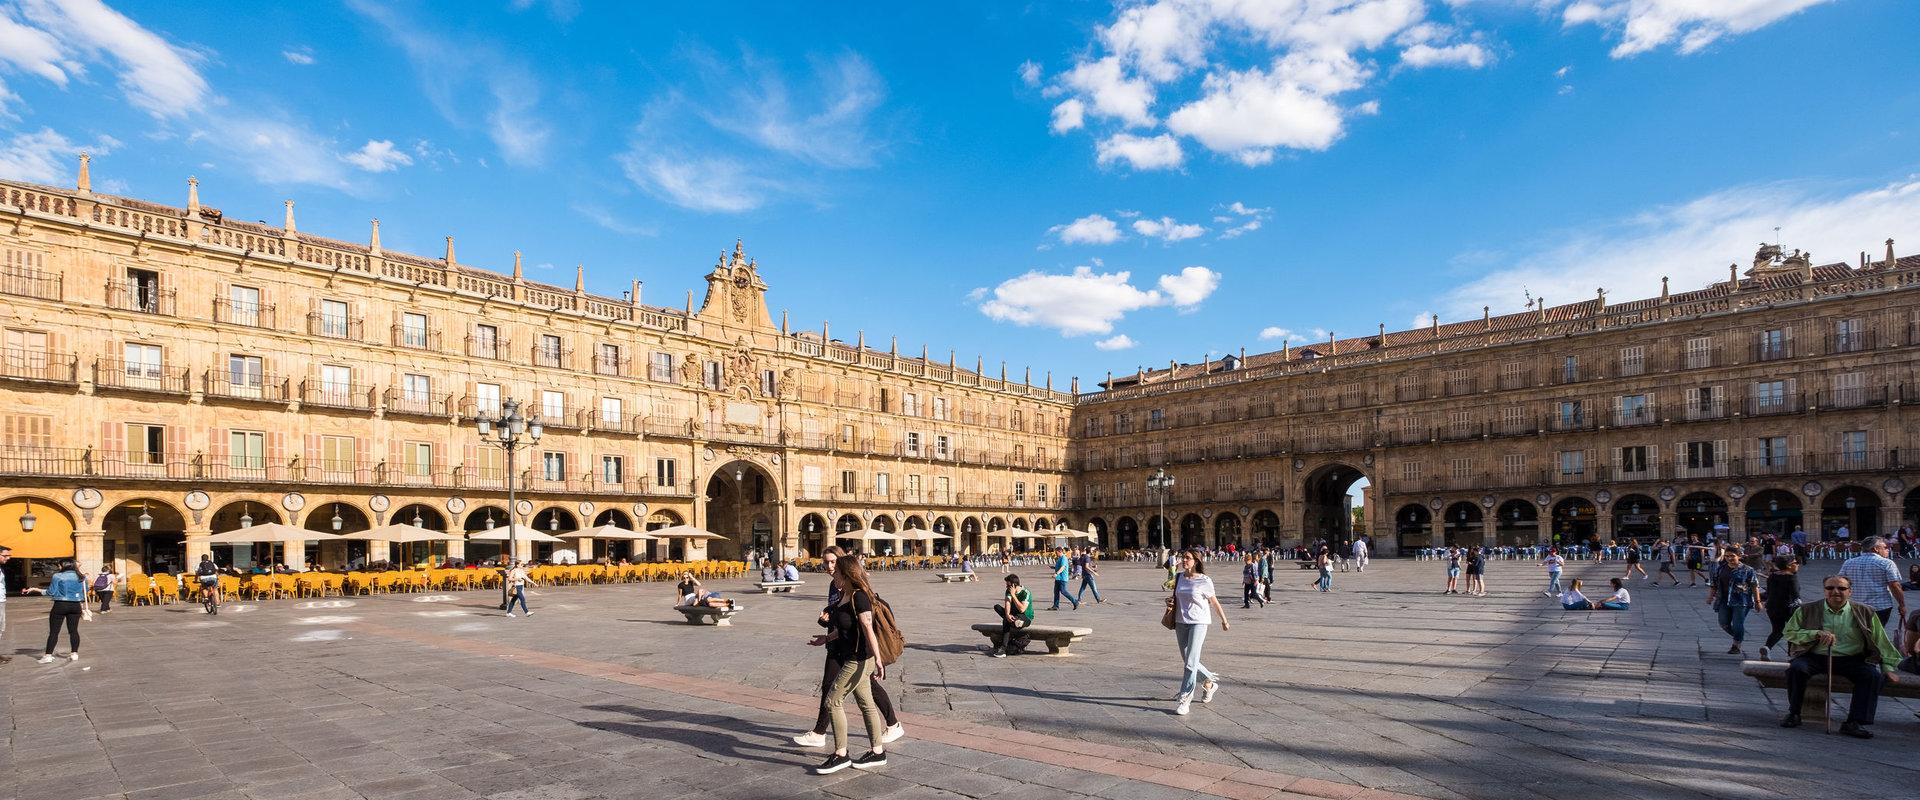 Universitet Spanien